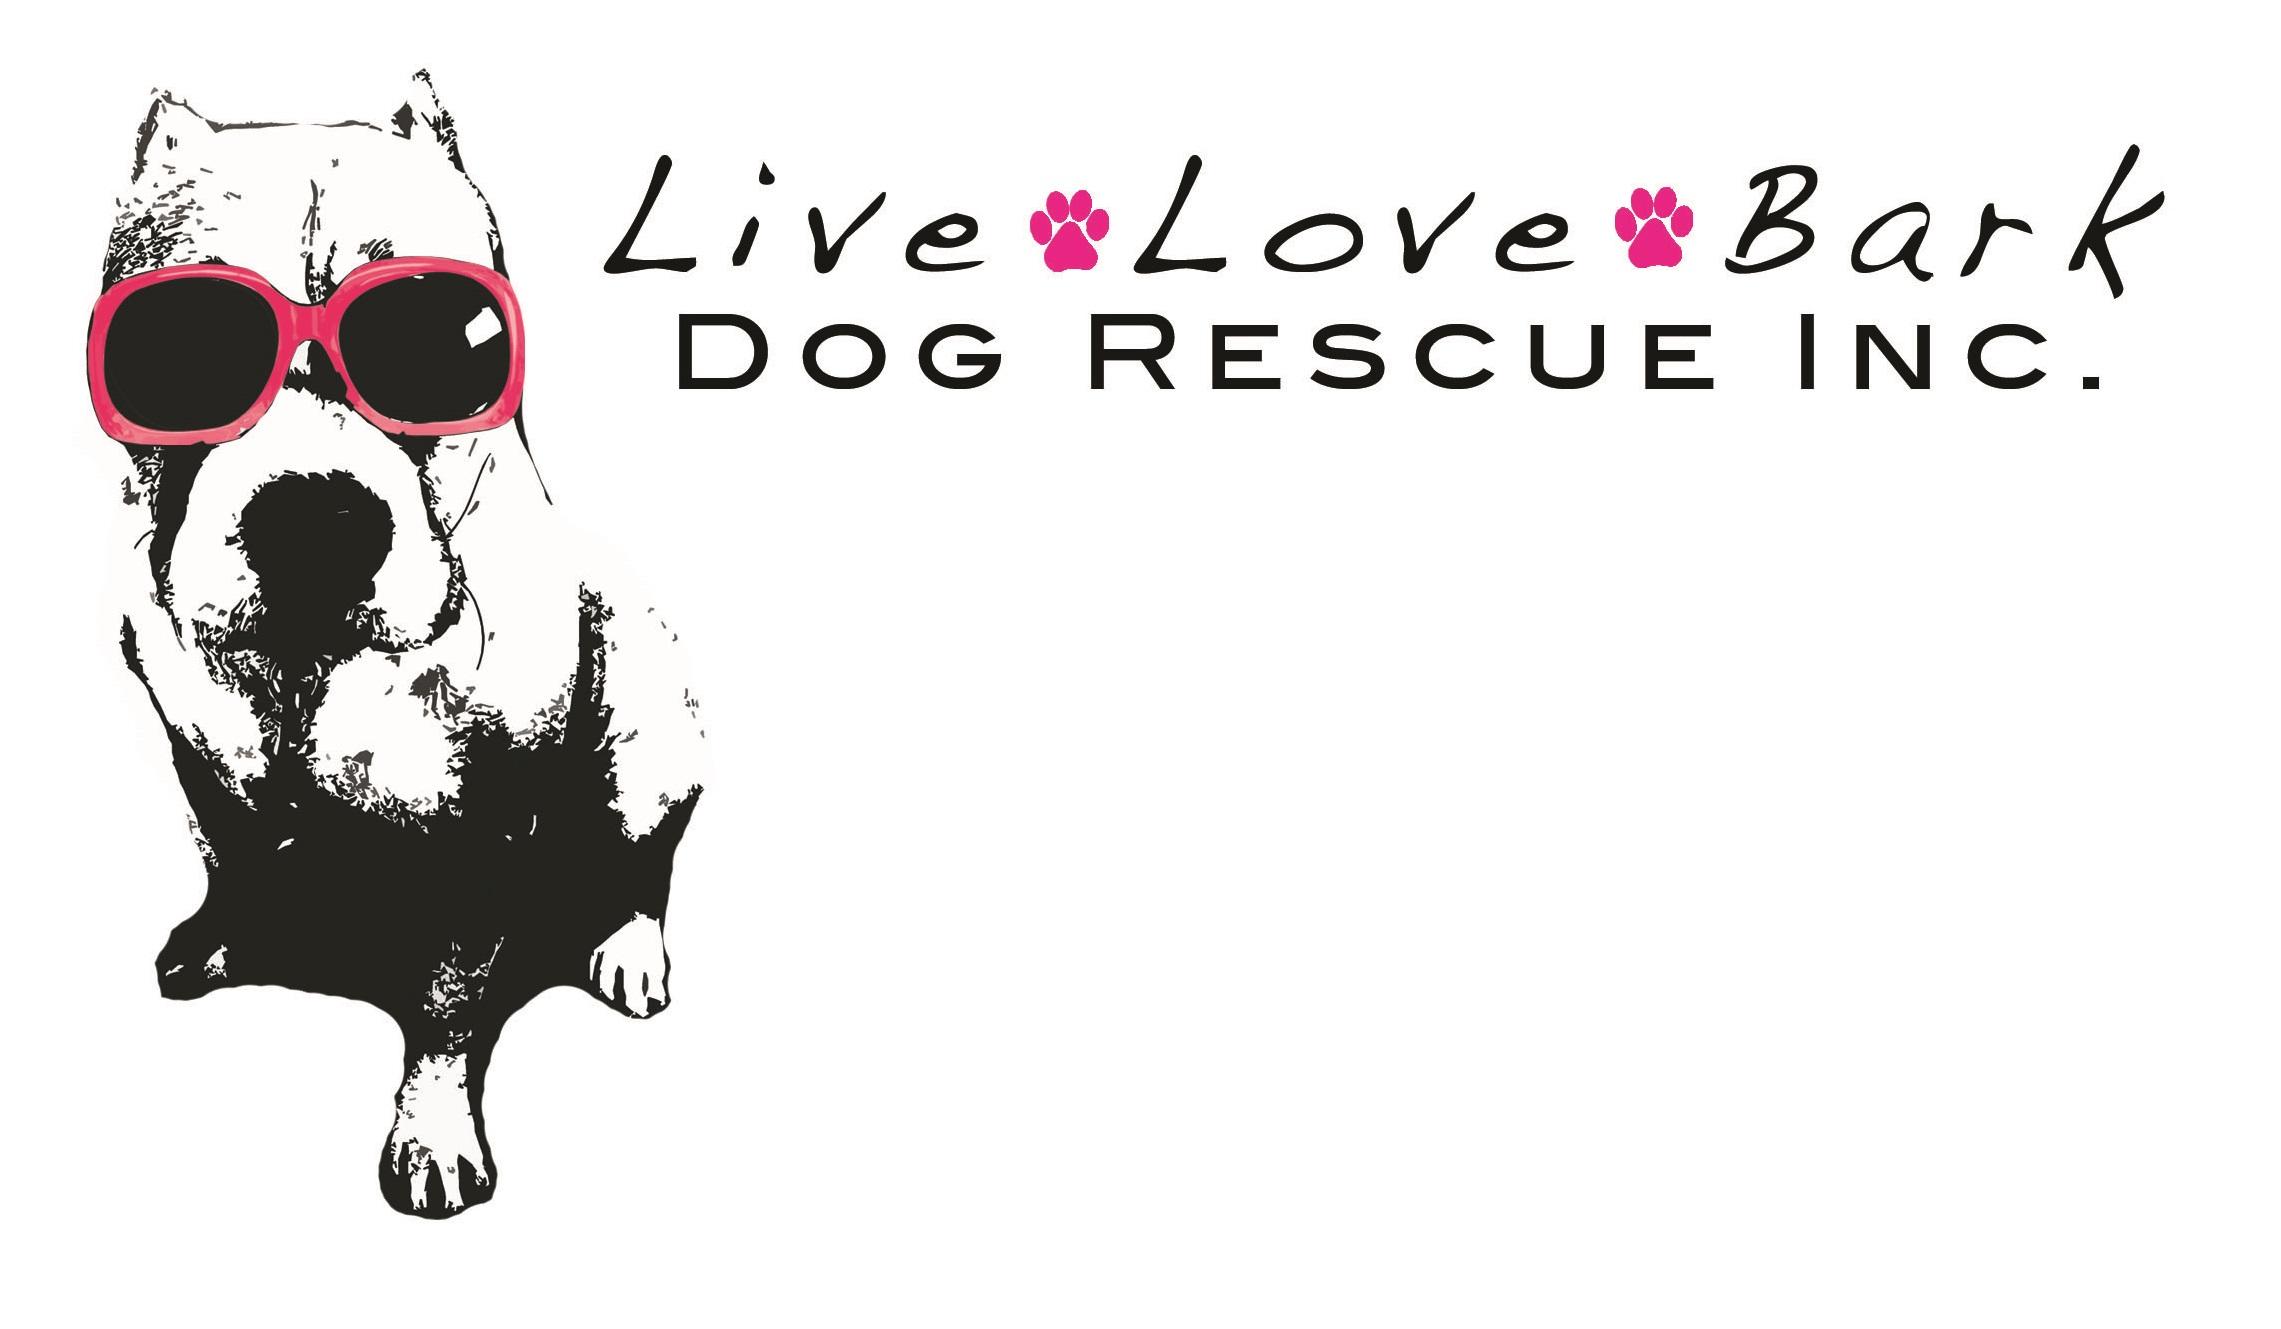 live love bark dog rescue inc